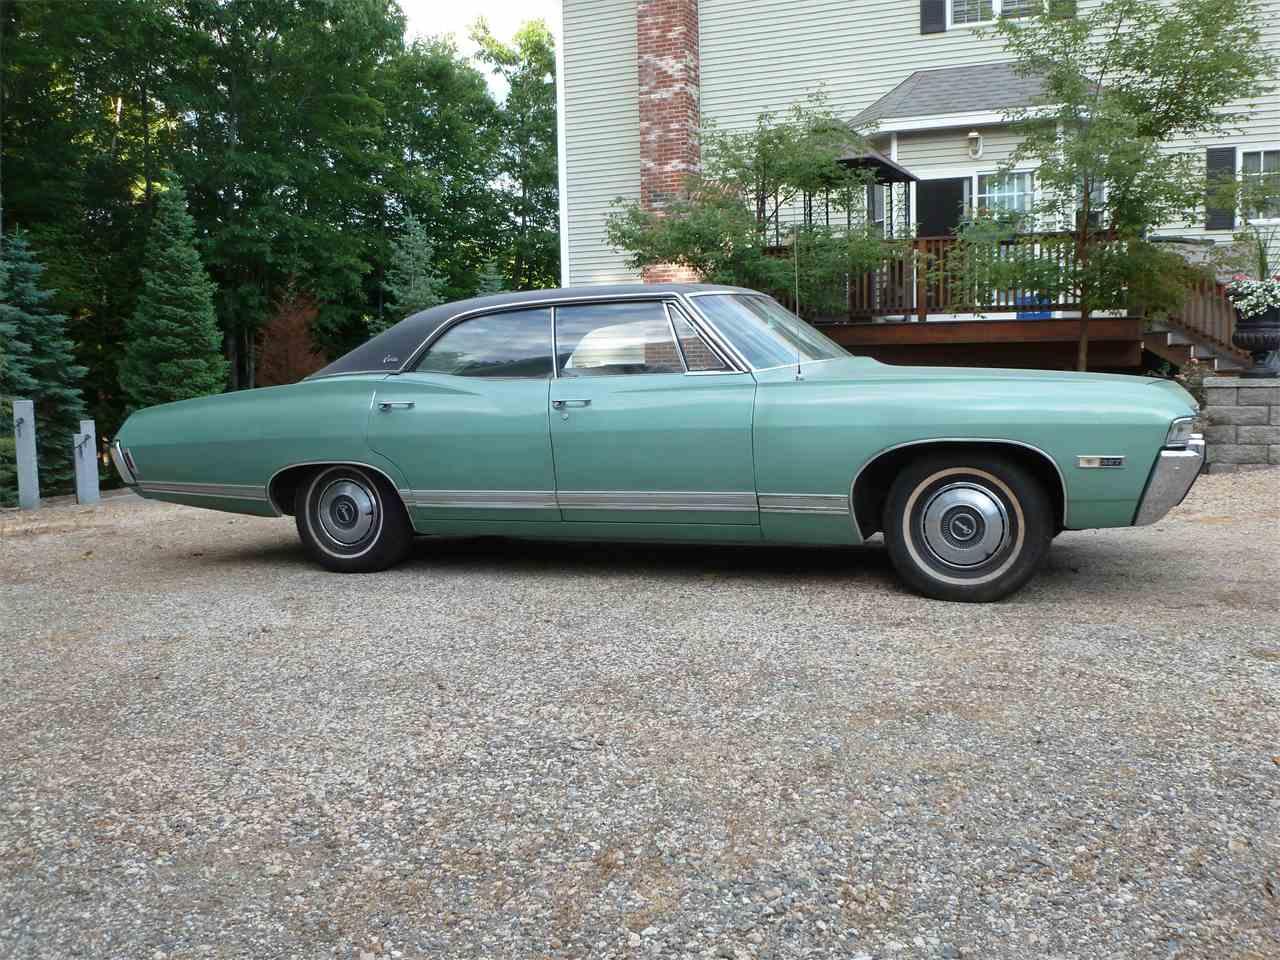 1968 Chevrolet Caprice For Sale Classiccars Com Cc 560226